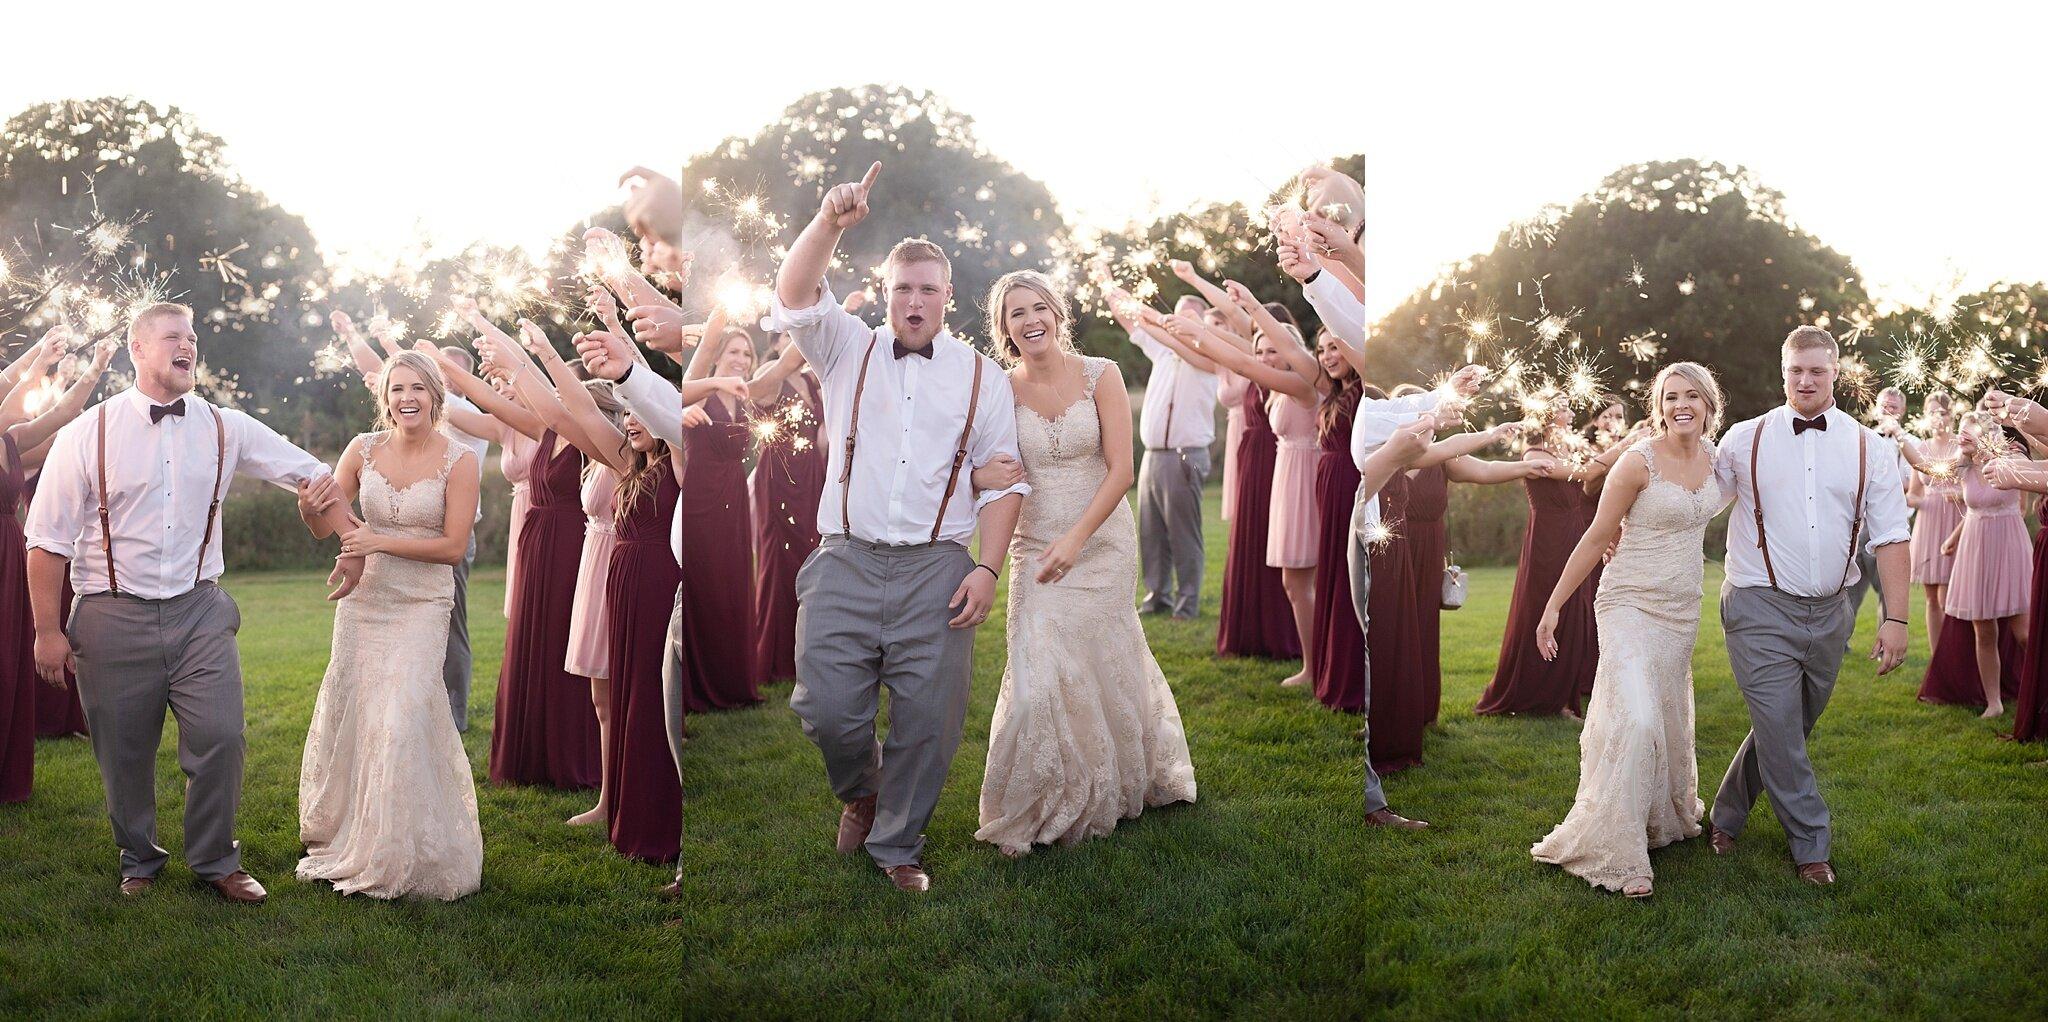 wedding party sparkler exit kate jones studios sioux falls wedding photographer